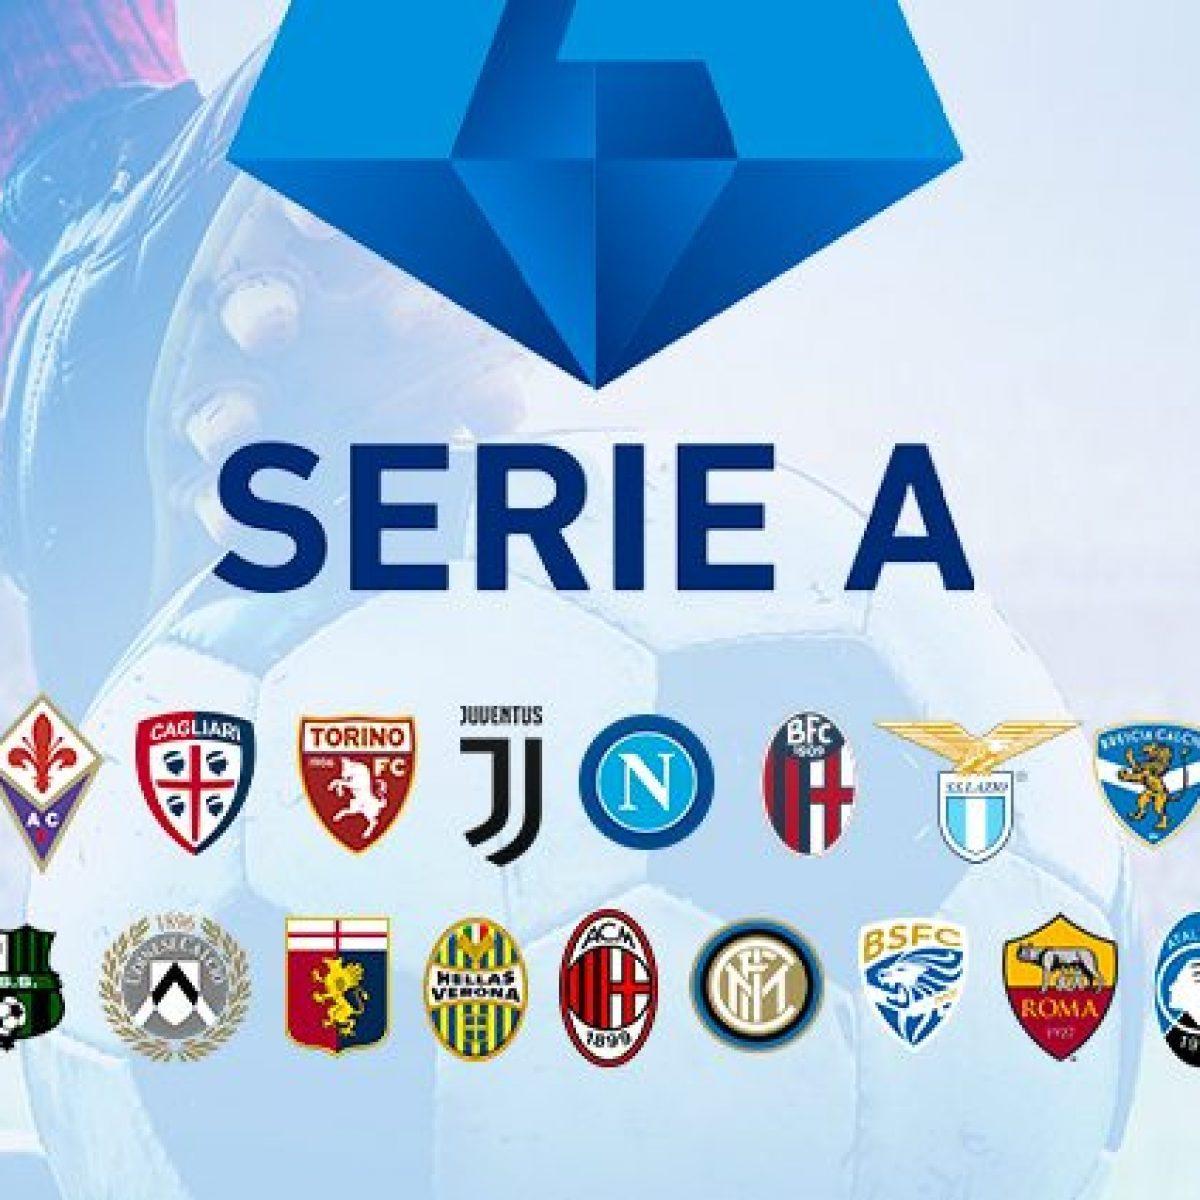 Pronostico Spal-Bologna, schedina Serie A del 25 gennaio 2020